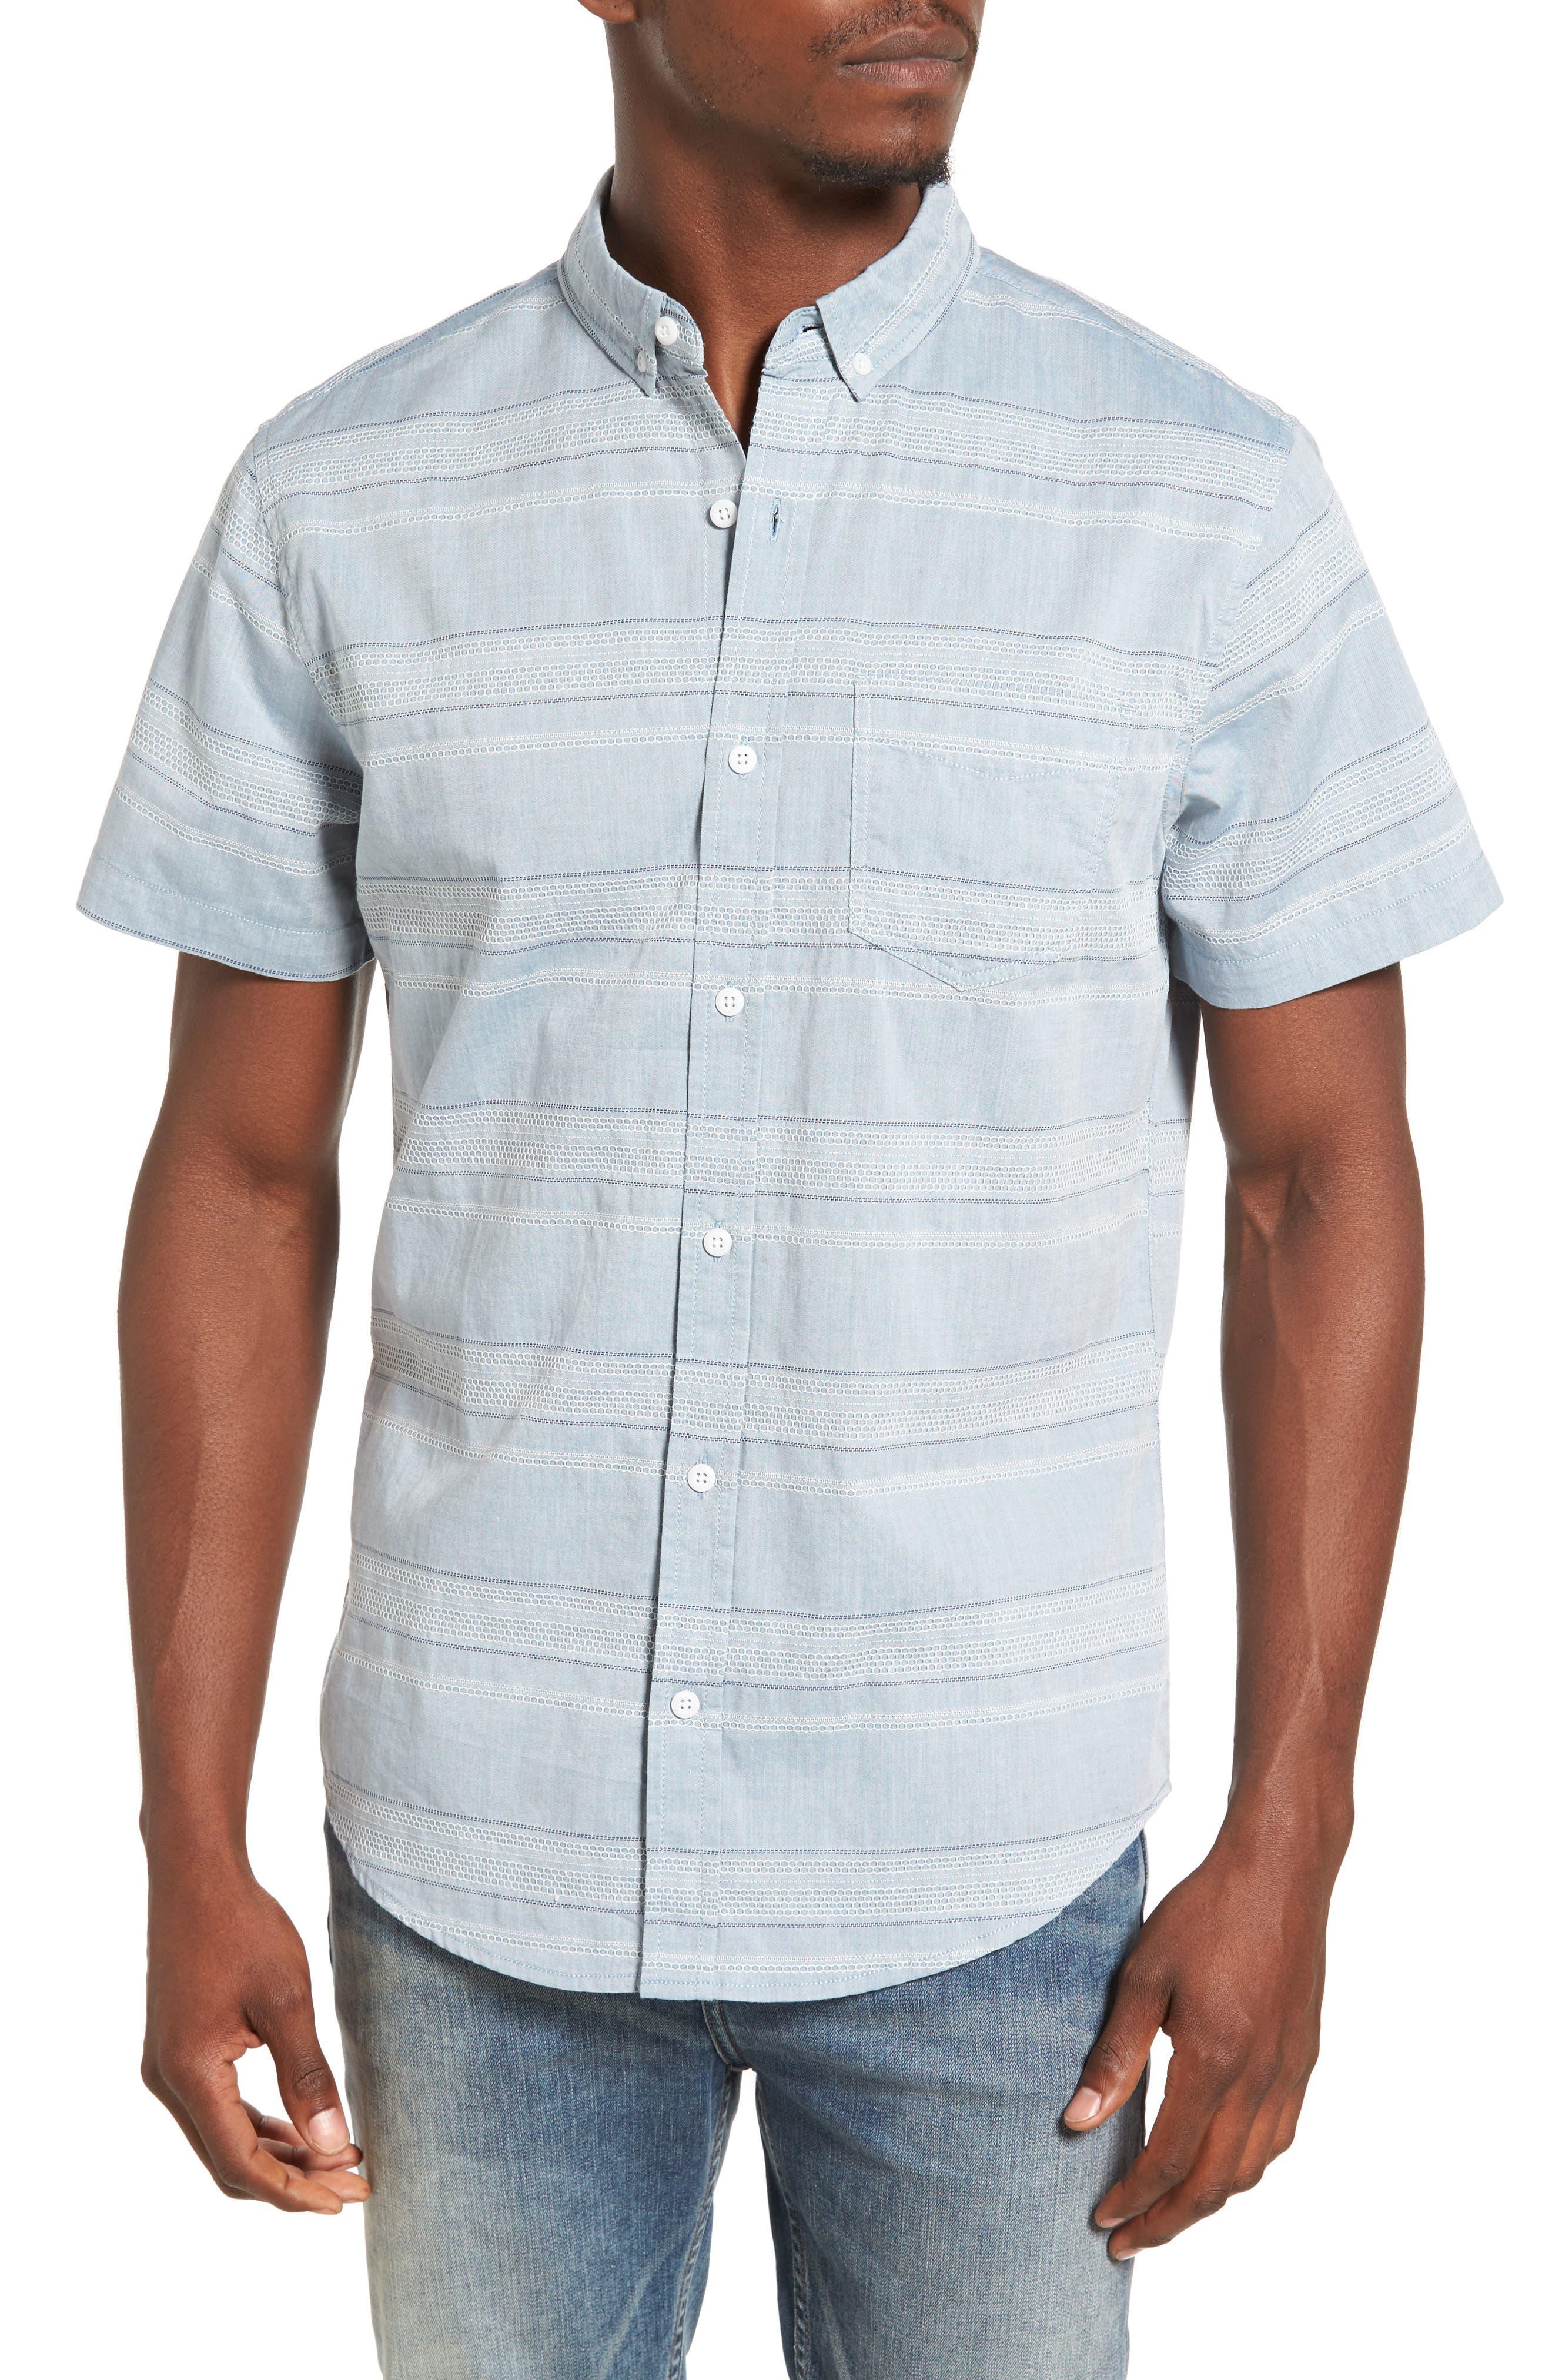 Alternate Image 1 Selected - 1901 Jacquard Trim Fit Sport Shirt